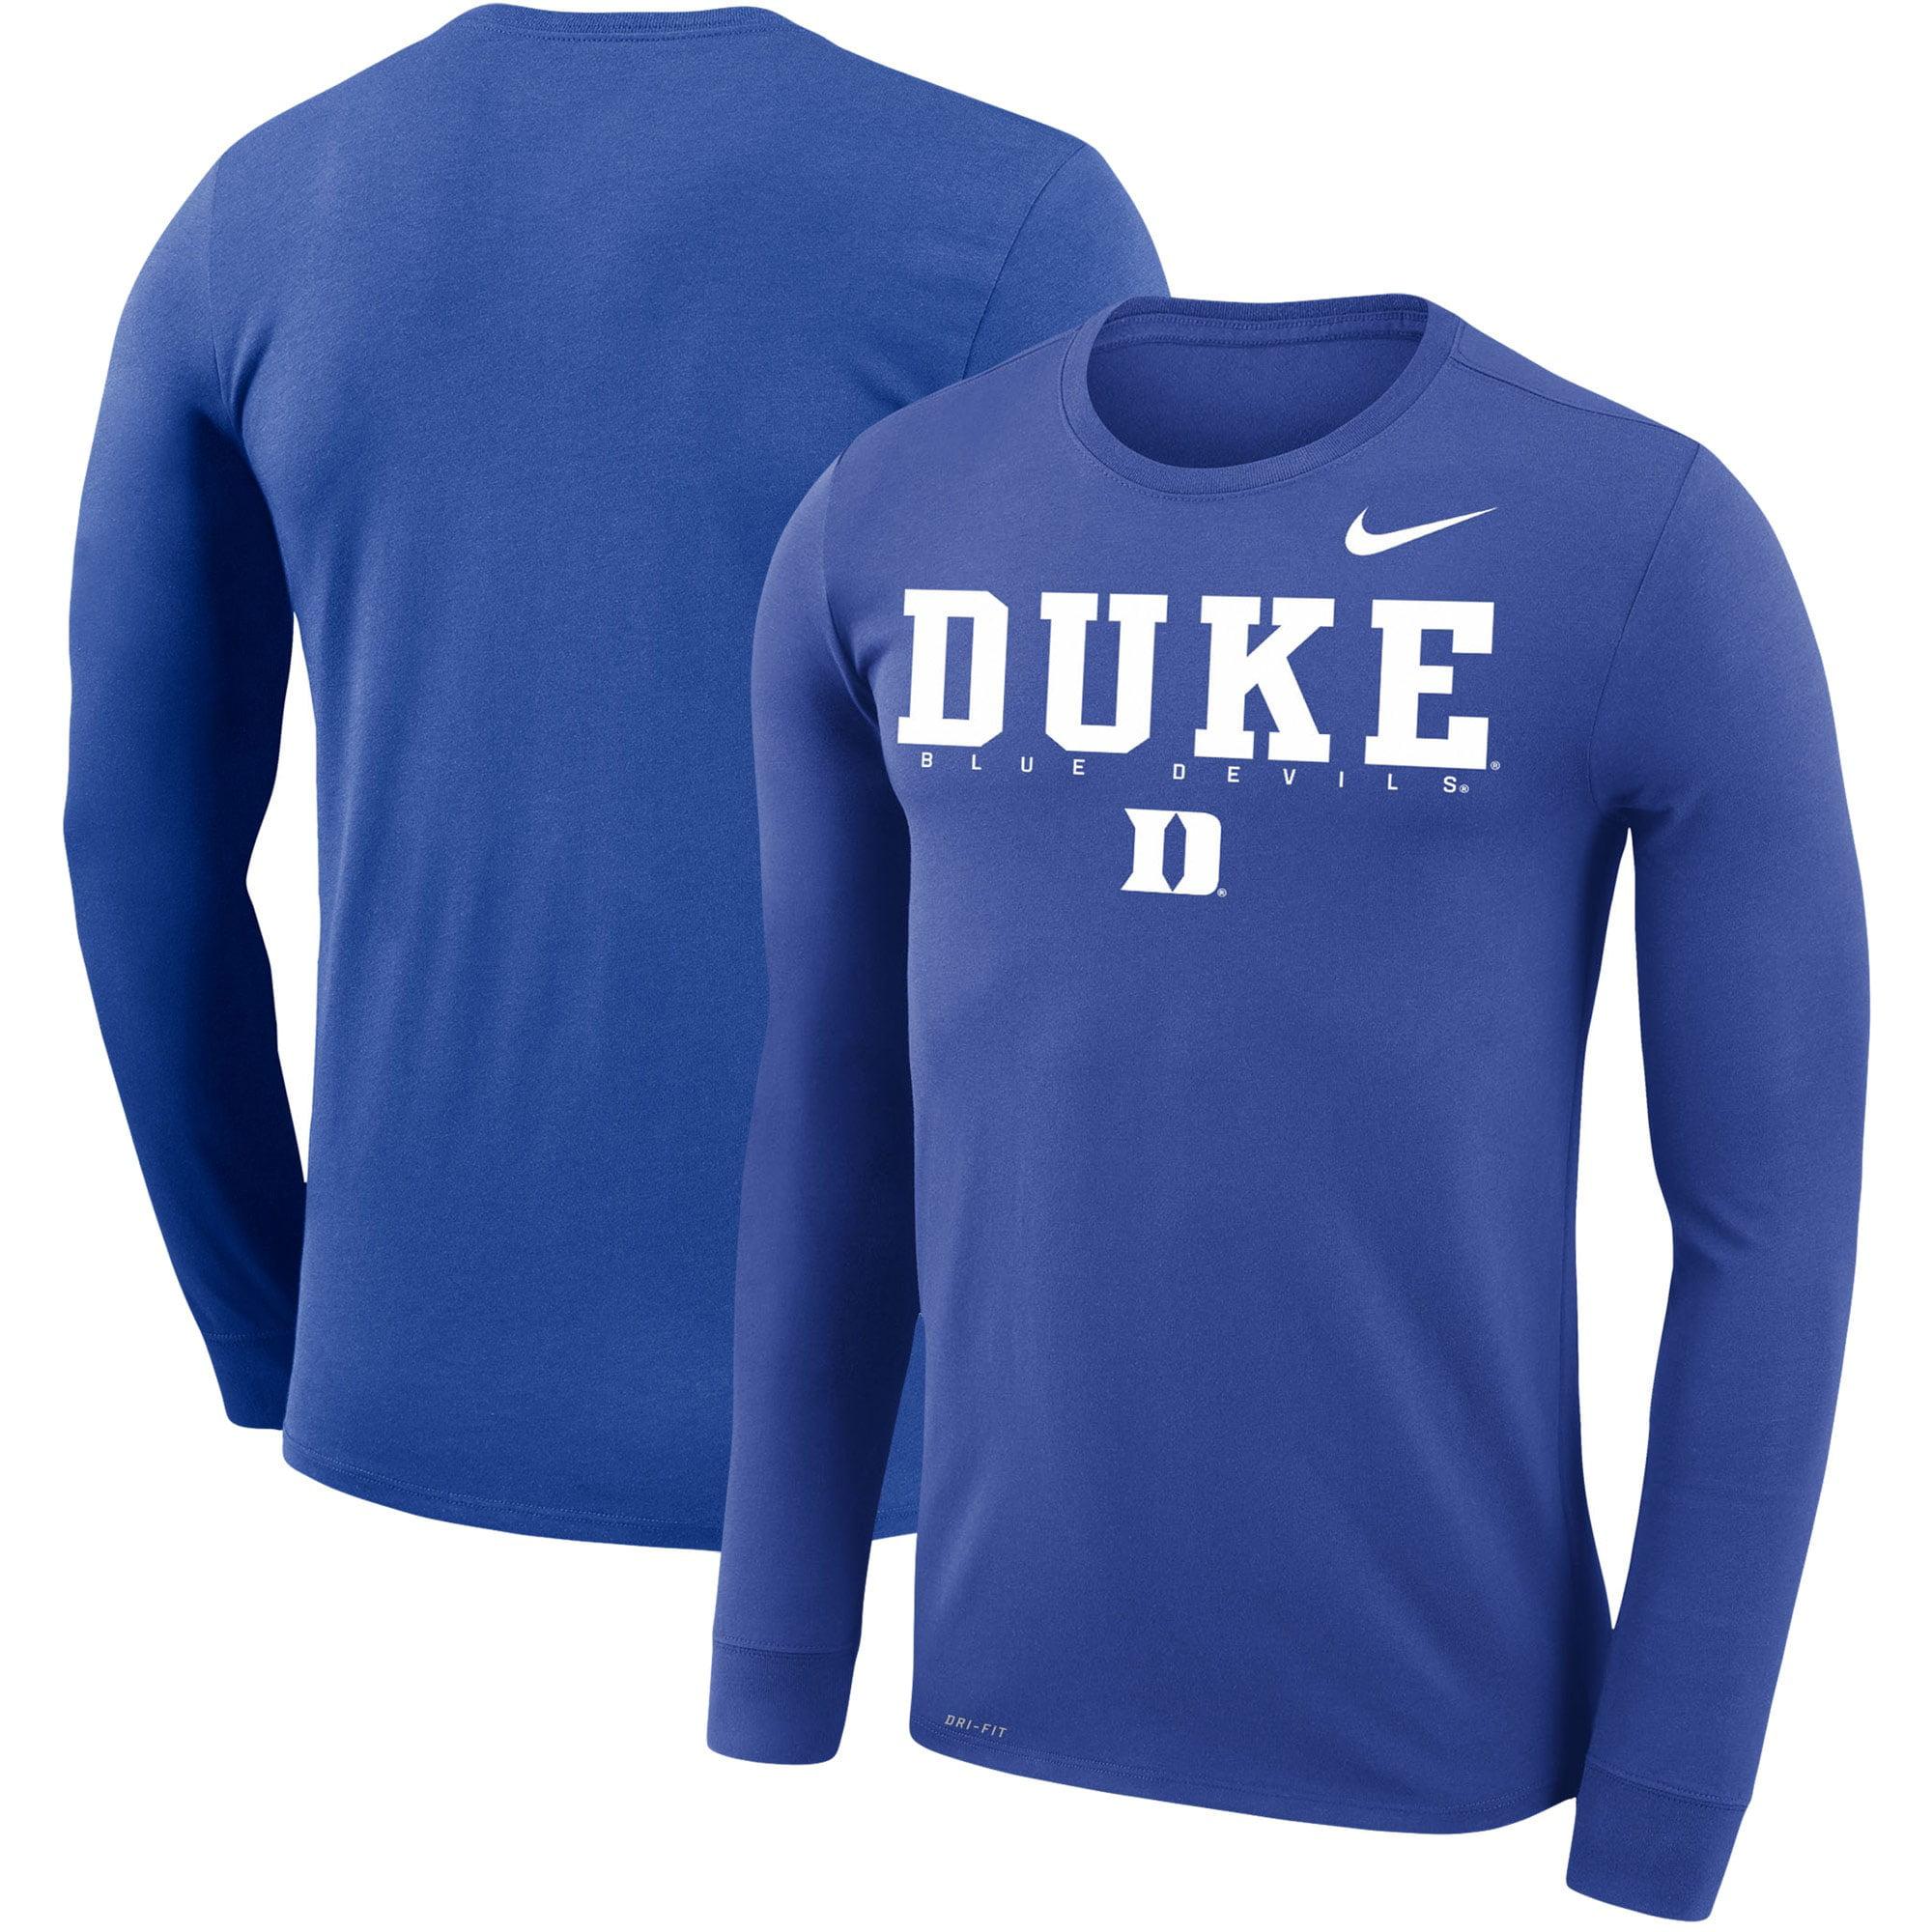 Champion Duke Blue Devils Adult NCAA Athletic Performance T-Shirt Royal